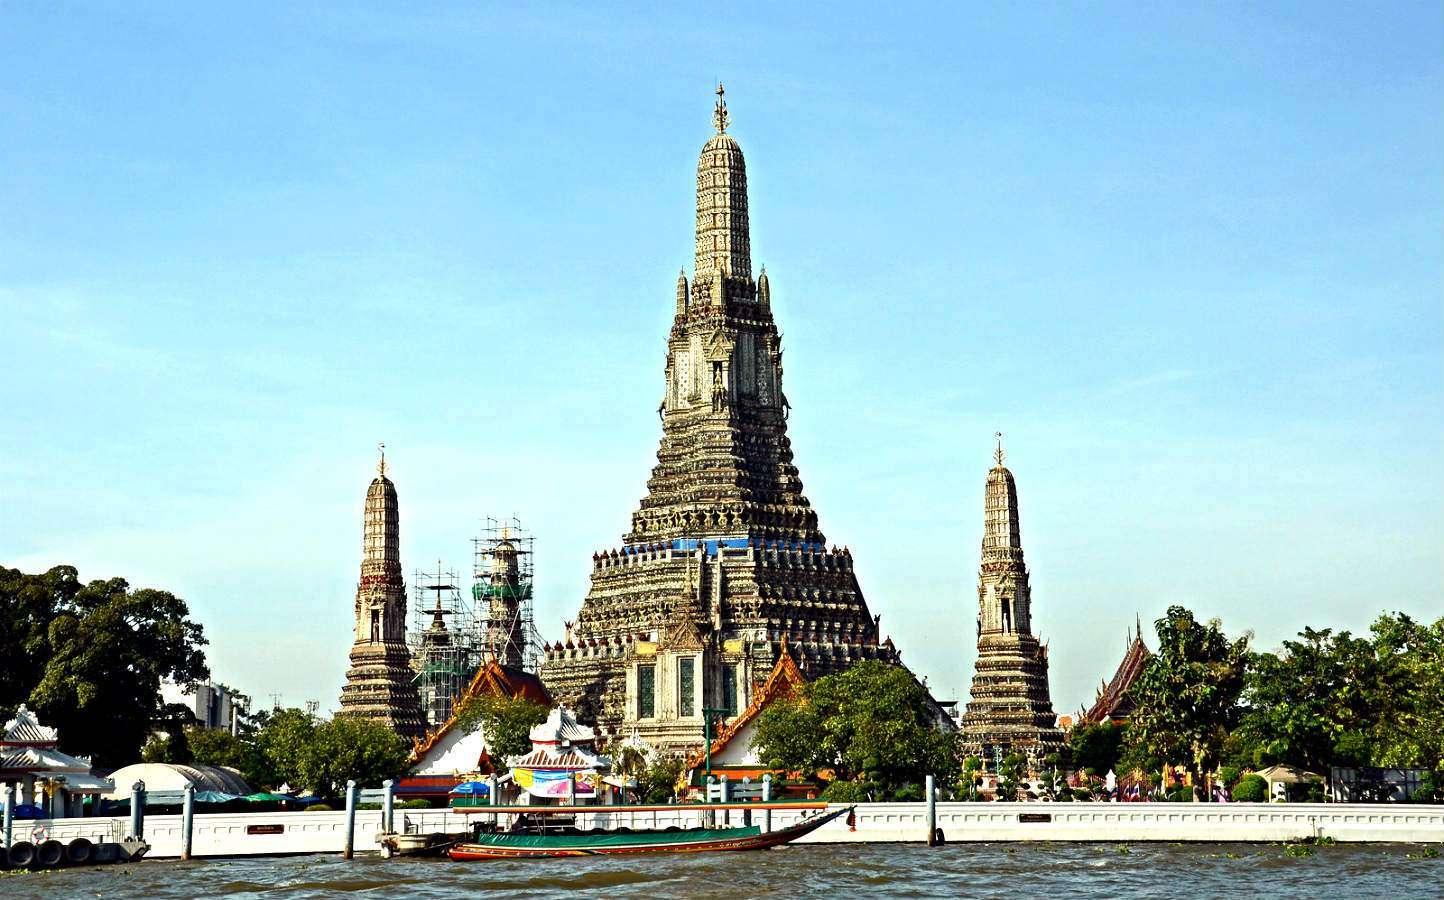 Wat Arun, temple of dawn, striking building on the Chao Phraya River in Bangkok